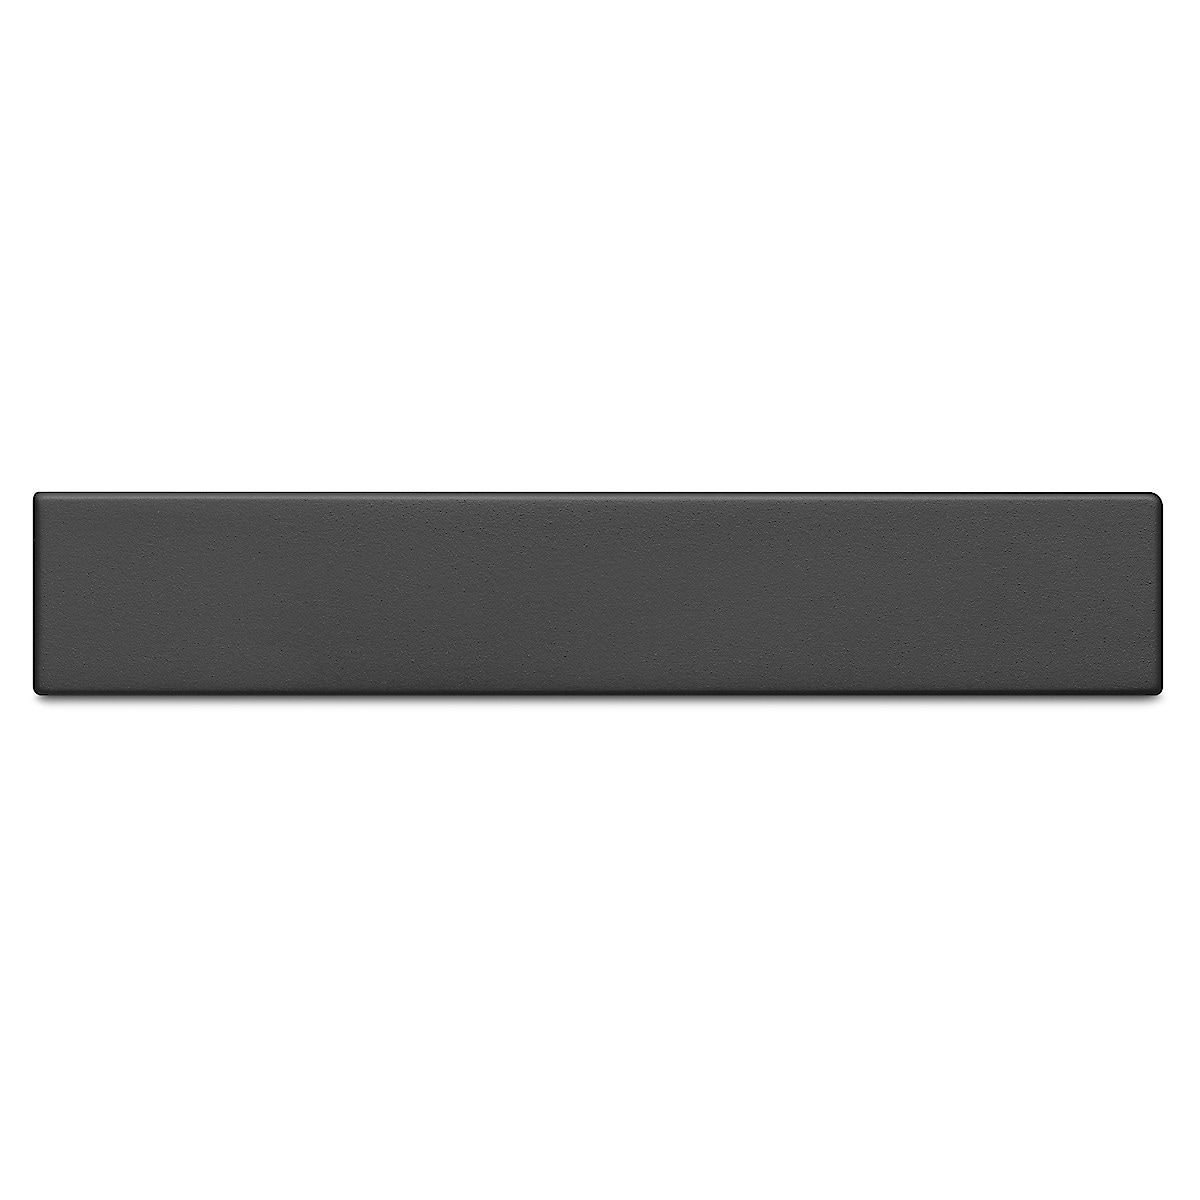 Extern hårddisk, Seagate Backup Plus Portable